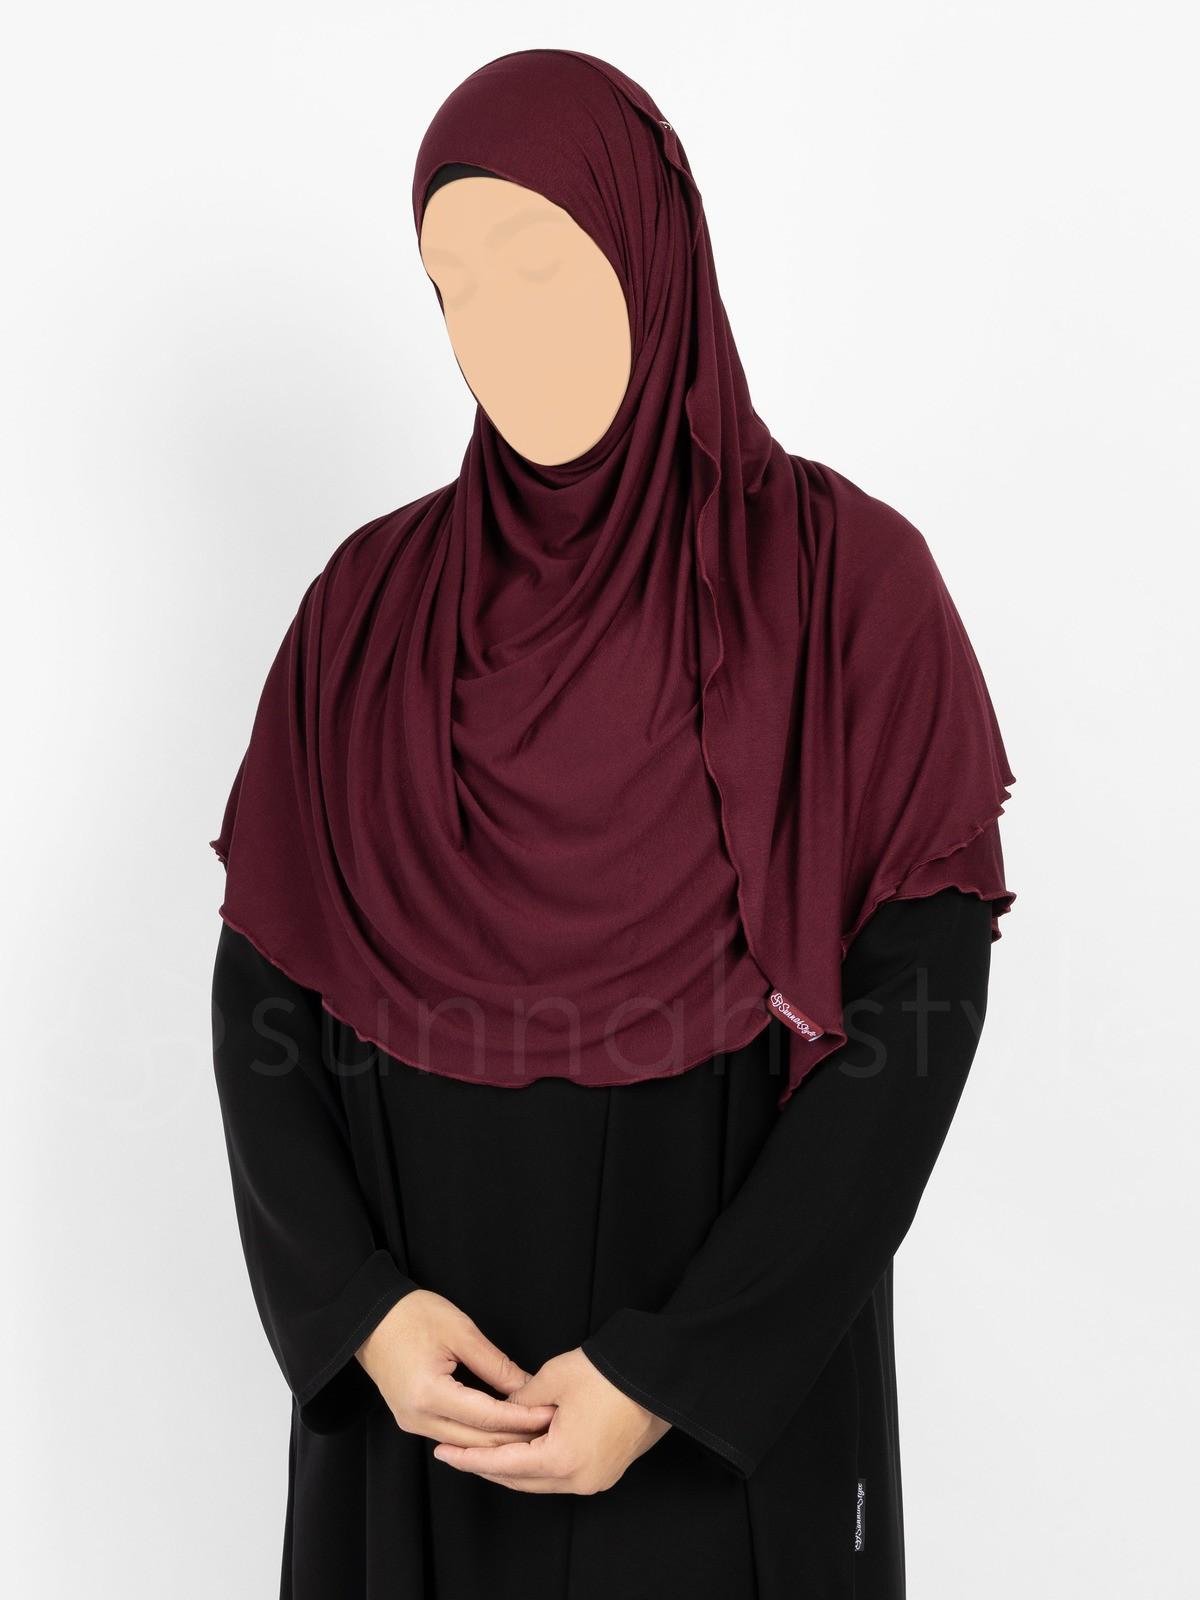 Sunnah Style Urban Shayla (Soft Jersey) - Large (Plum)